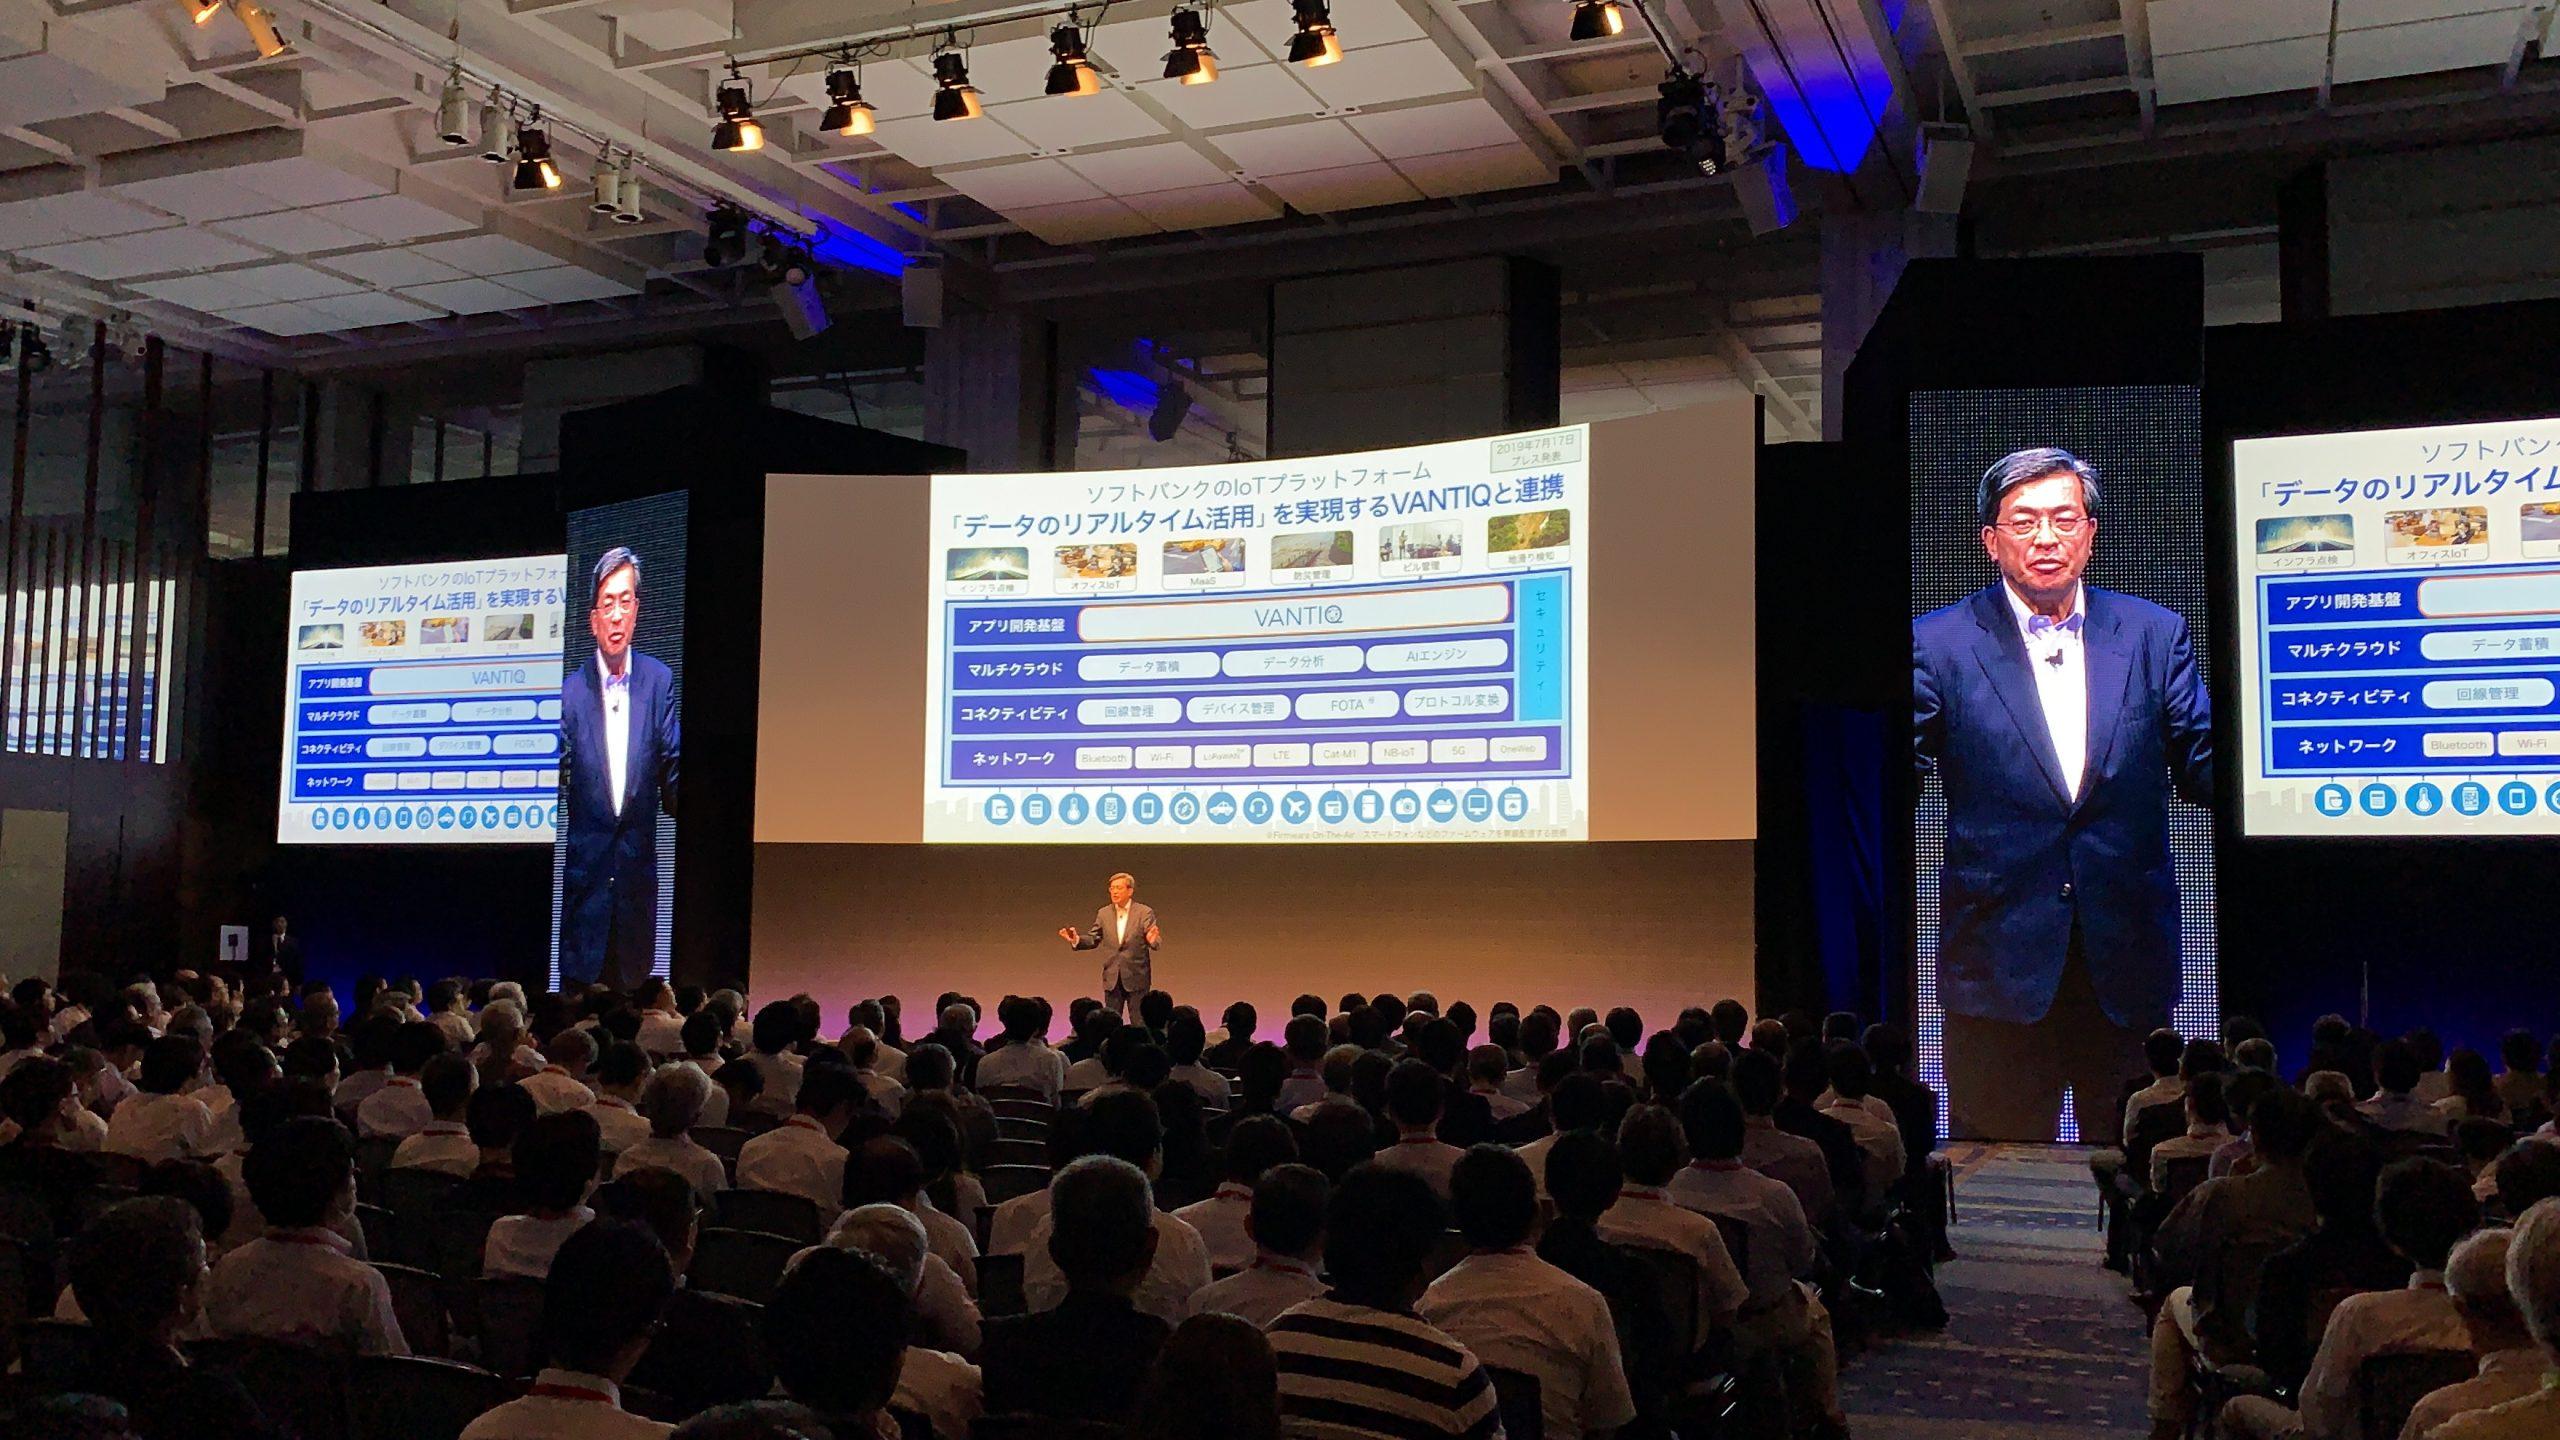 SoftBank COO Imai-san talks about VANTIQ at SoftBank World 2019